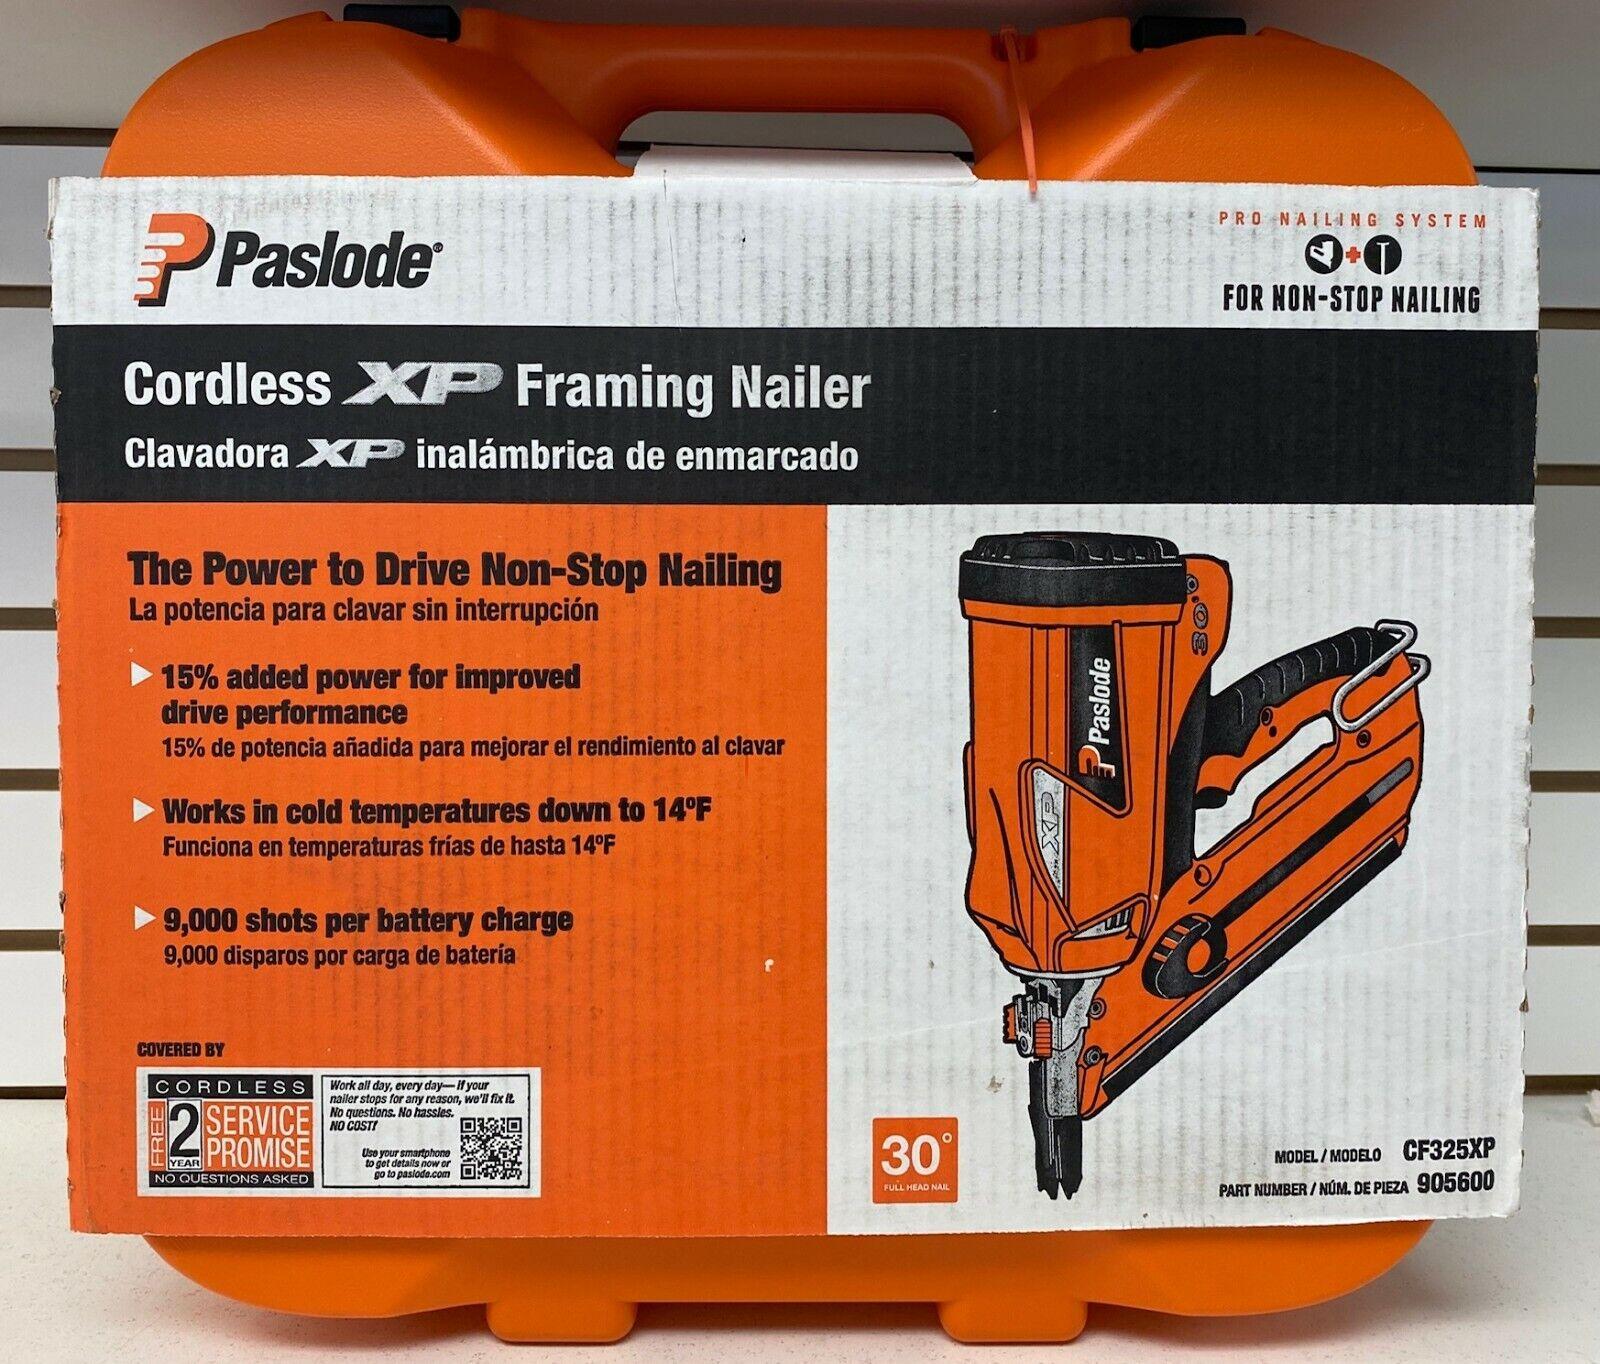 Paslode CF325XP Cordless 30 -Degree Framing Nailer Nail Gun,